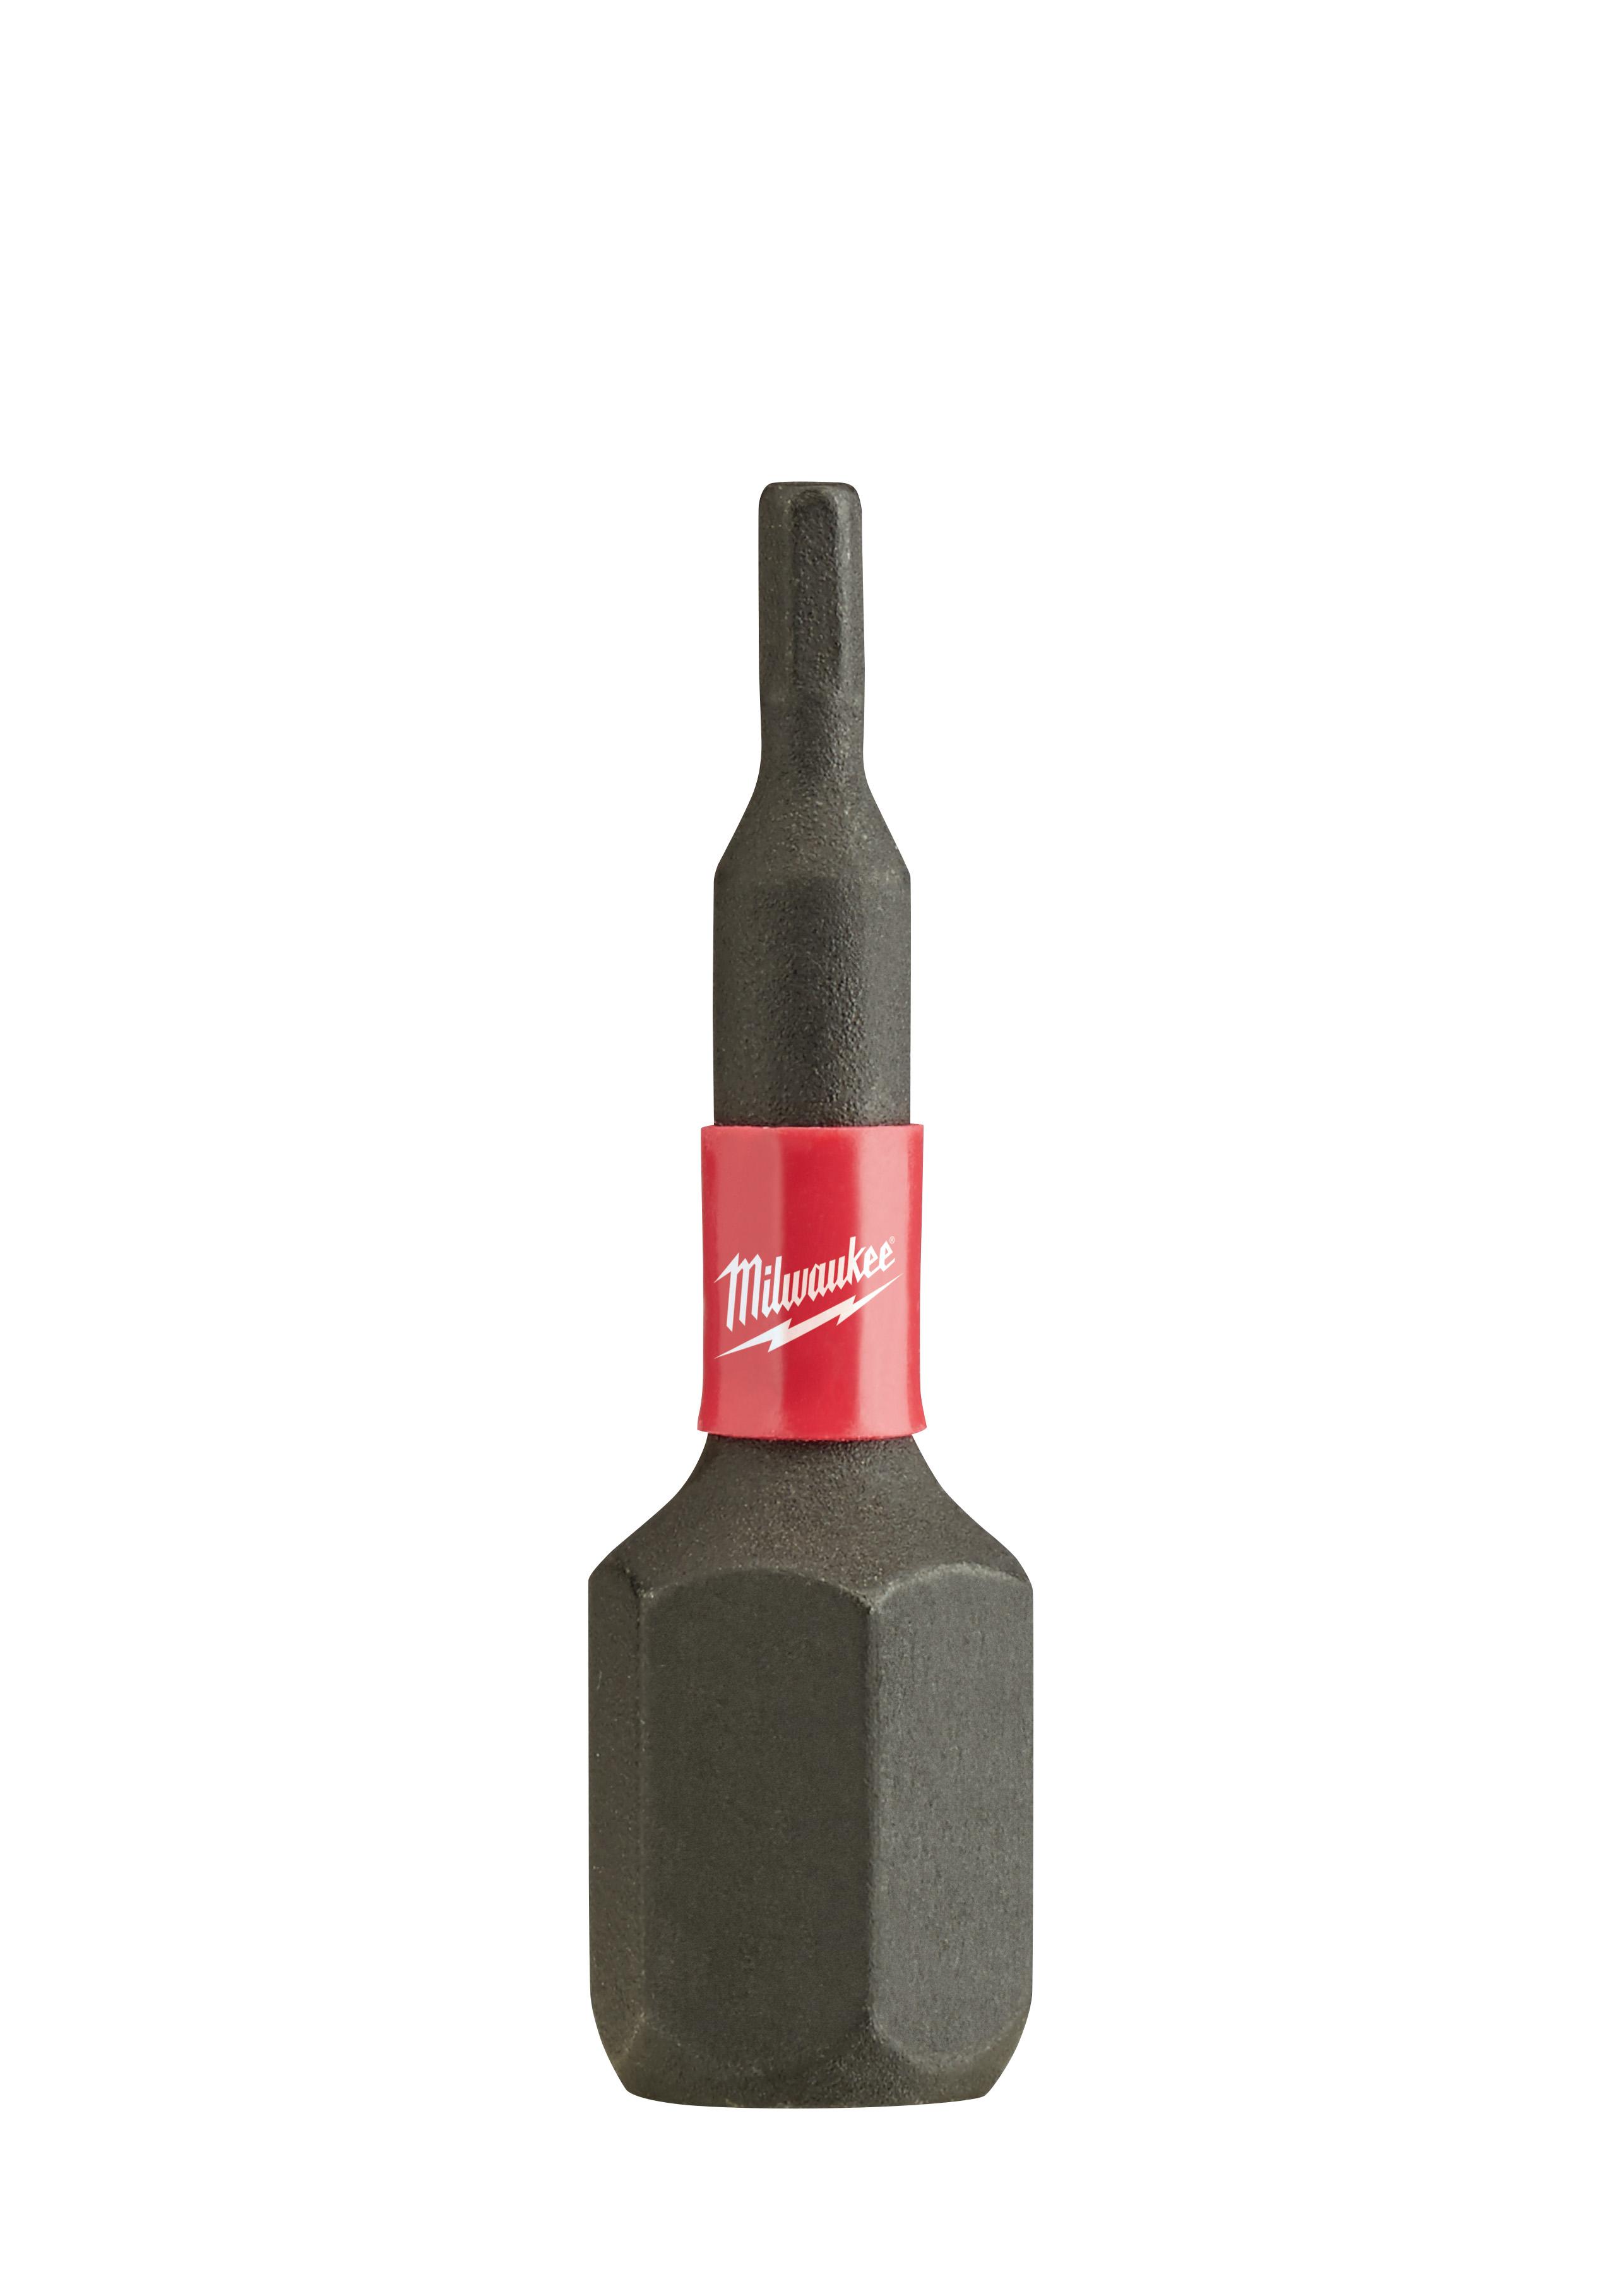 Milwaukee® SHOCKWAVE™ 48-32-4700 Impact Insert Bit, 1/16 in Hex Point, 1 in OAL, Proprietary Steel